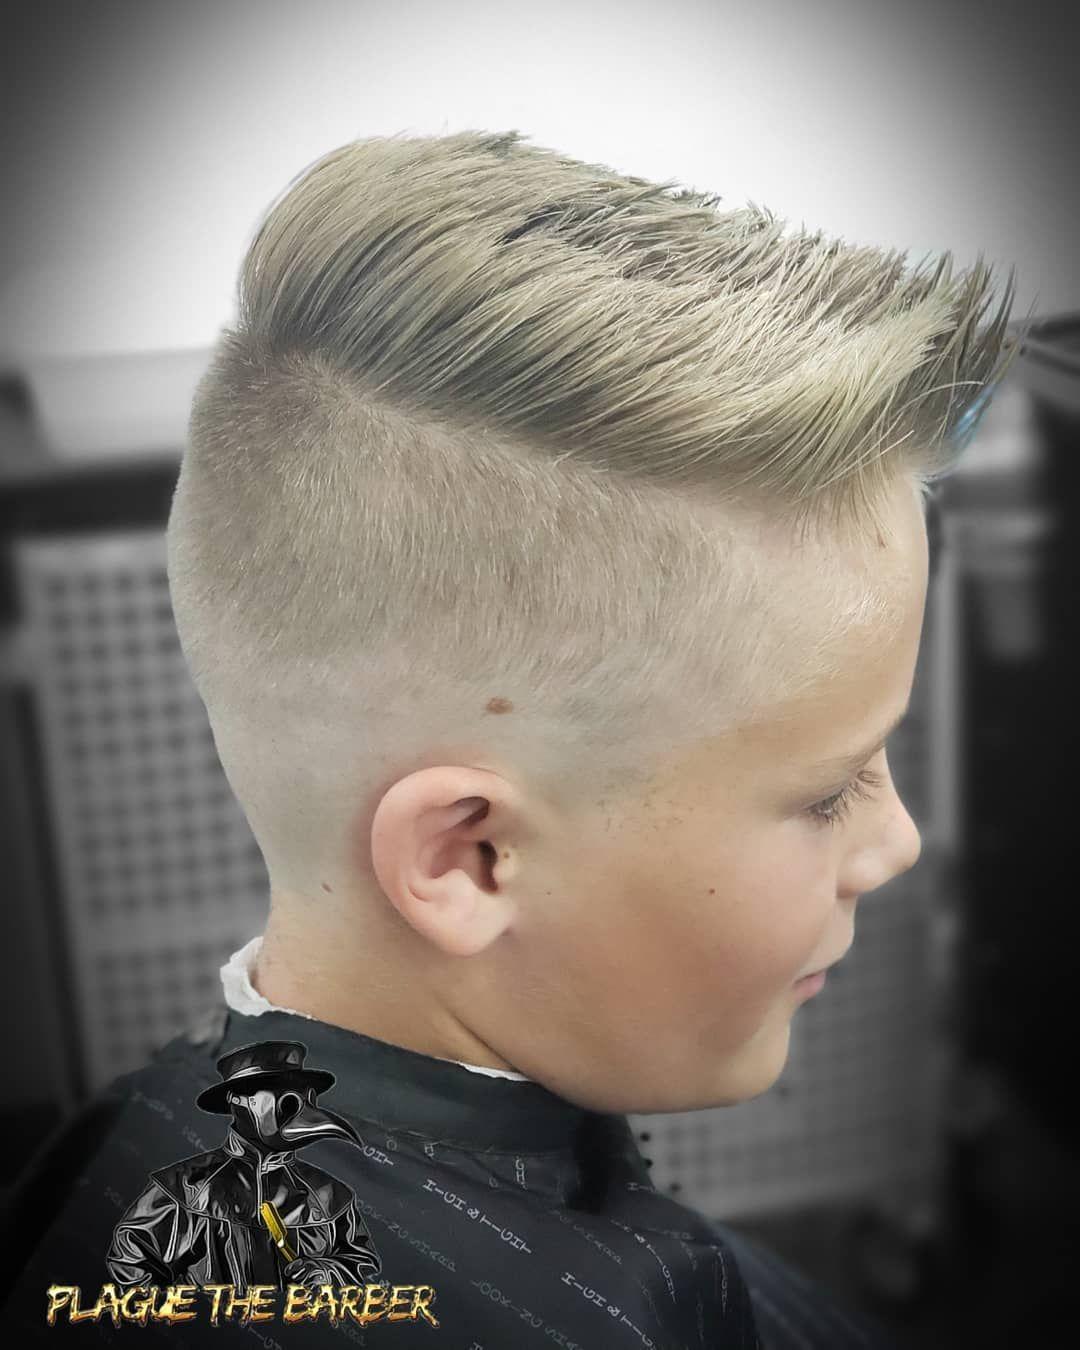 Skin Fade On The Little Man Barber Barbershop Barberlife Fade Haircut Hair Barbers Hairstyle Barberin Kids Hairstyles Barber Life Hair Styles